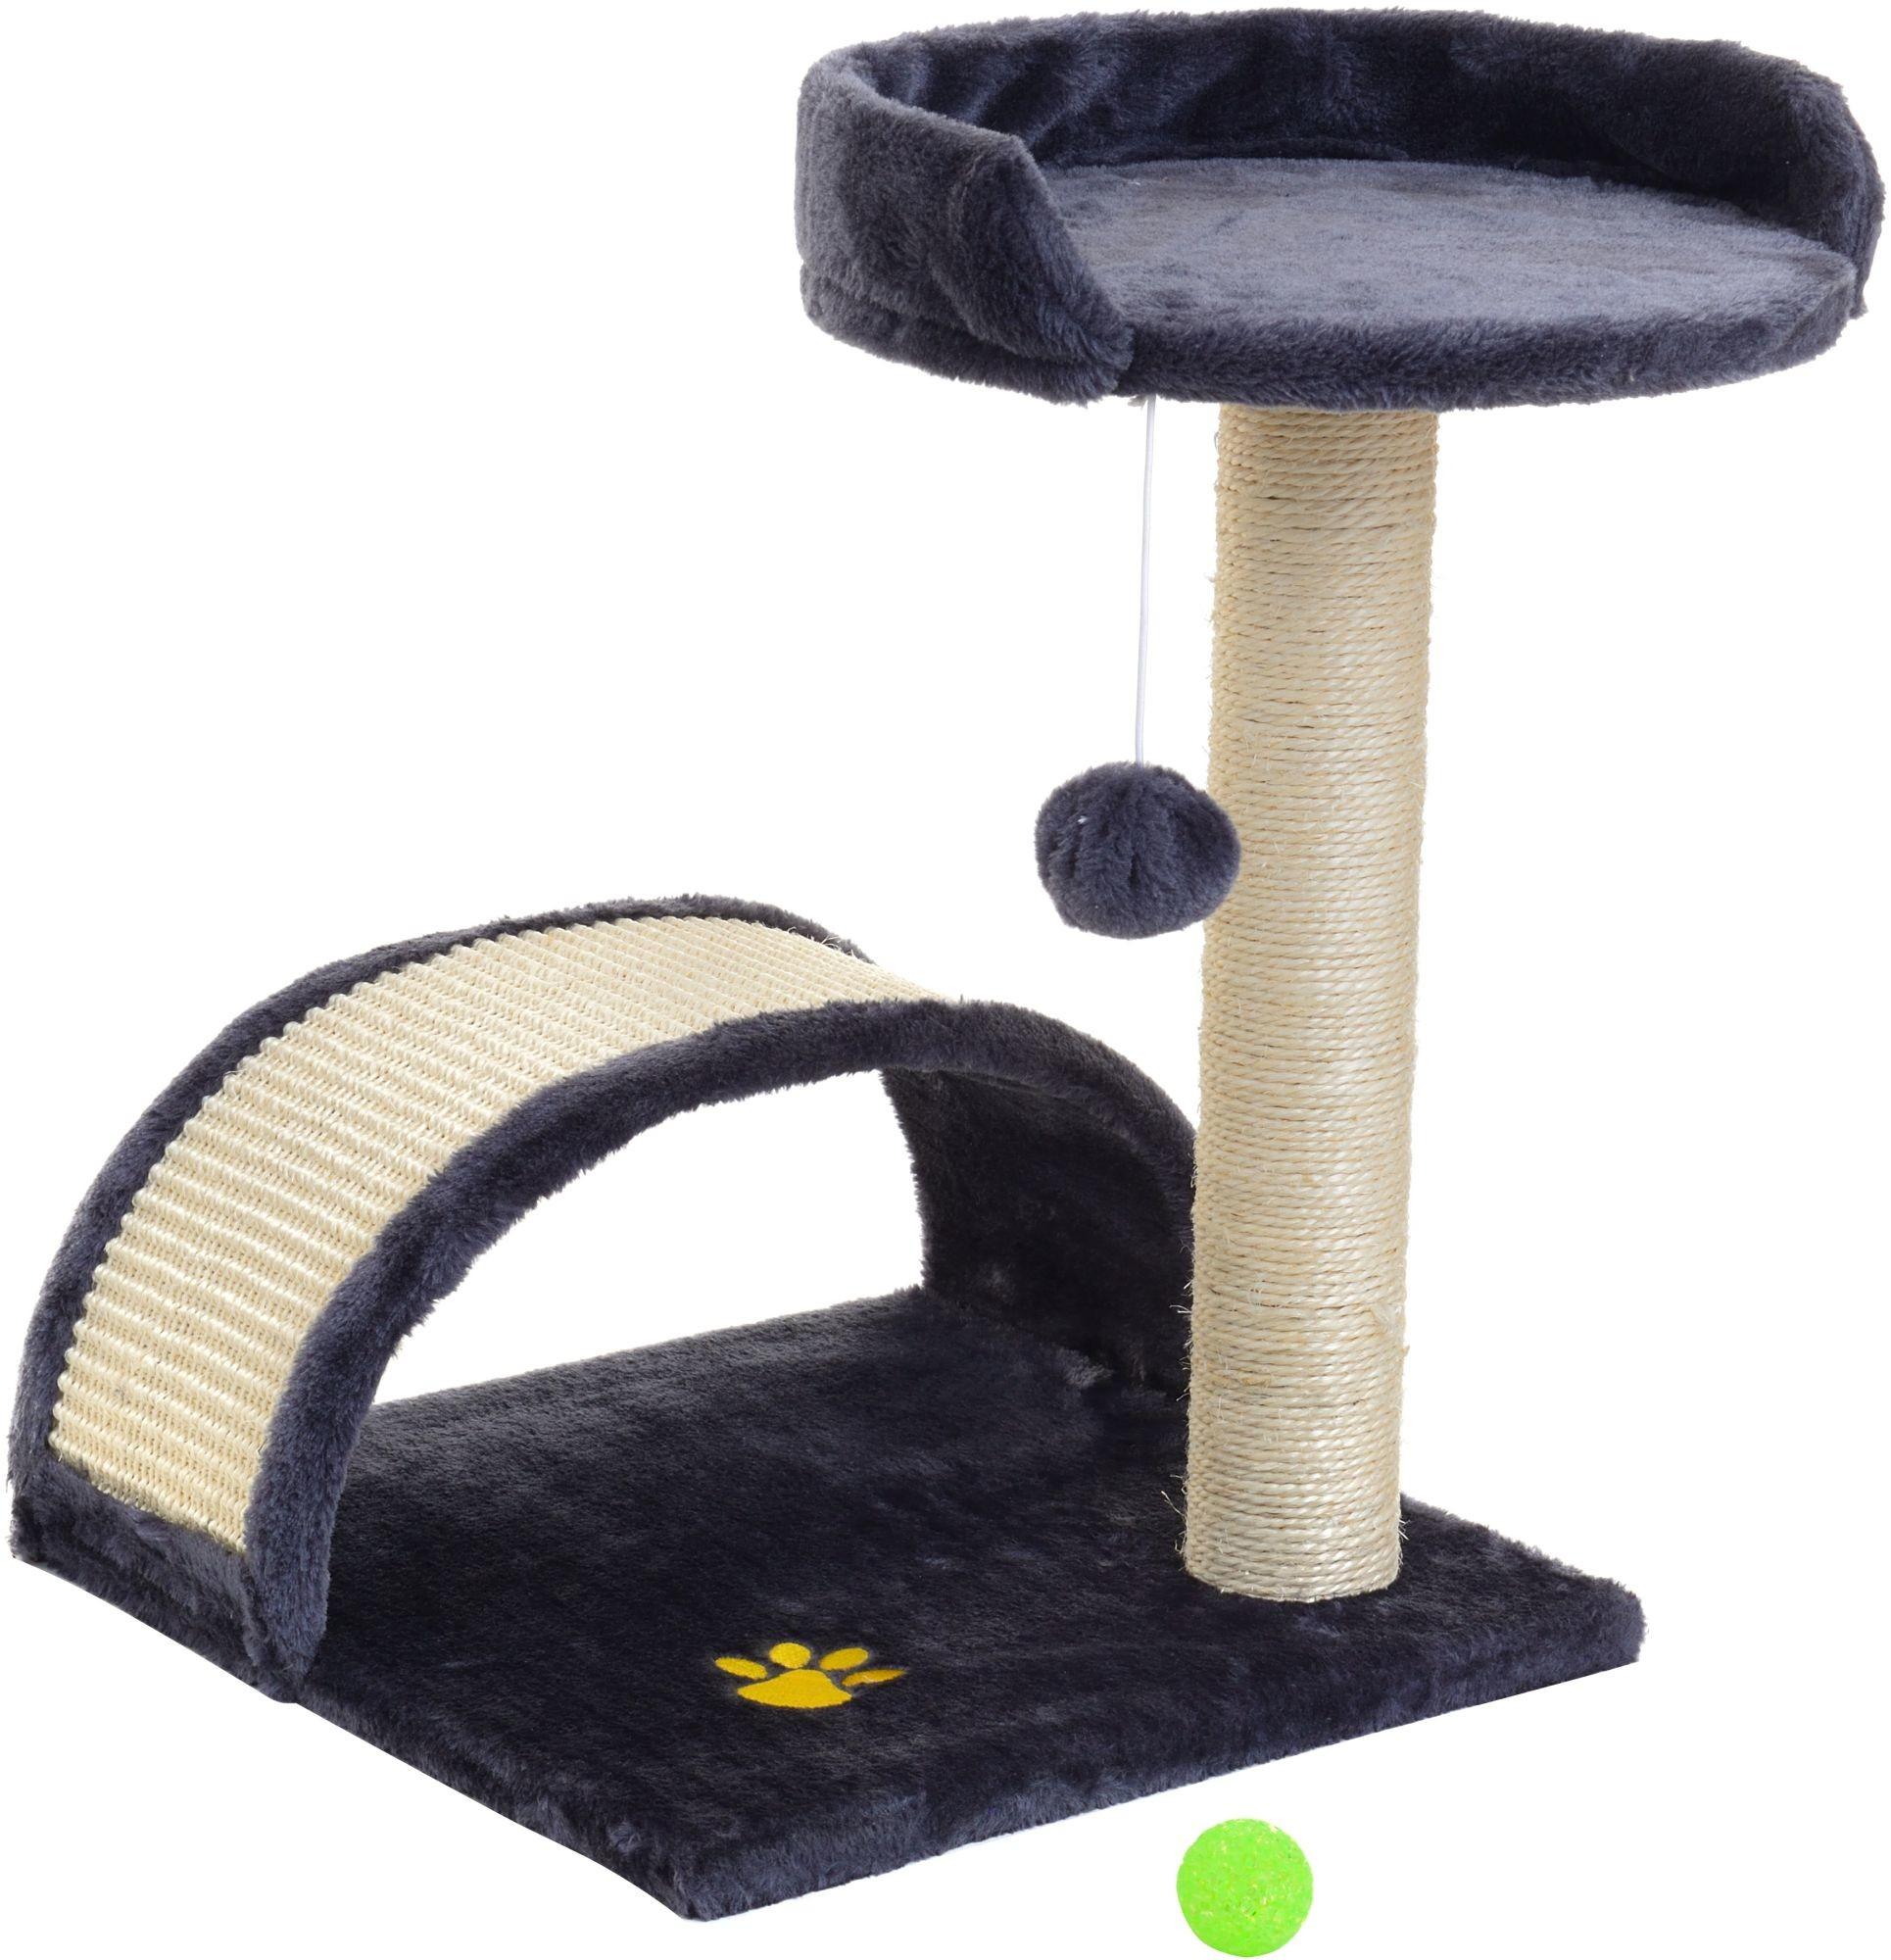 Drapak Dla Kota Domek Legowisko Słupek 90CM +piłka